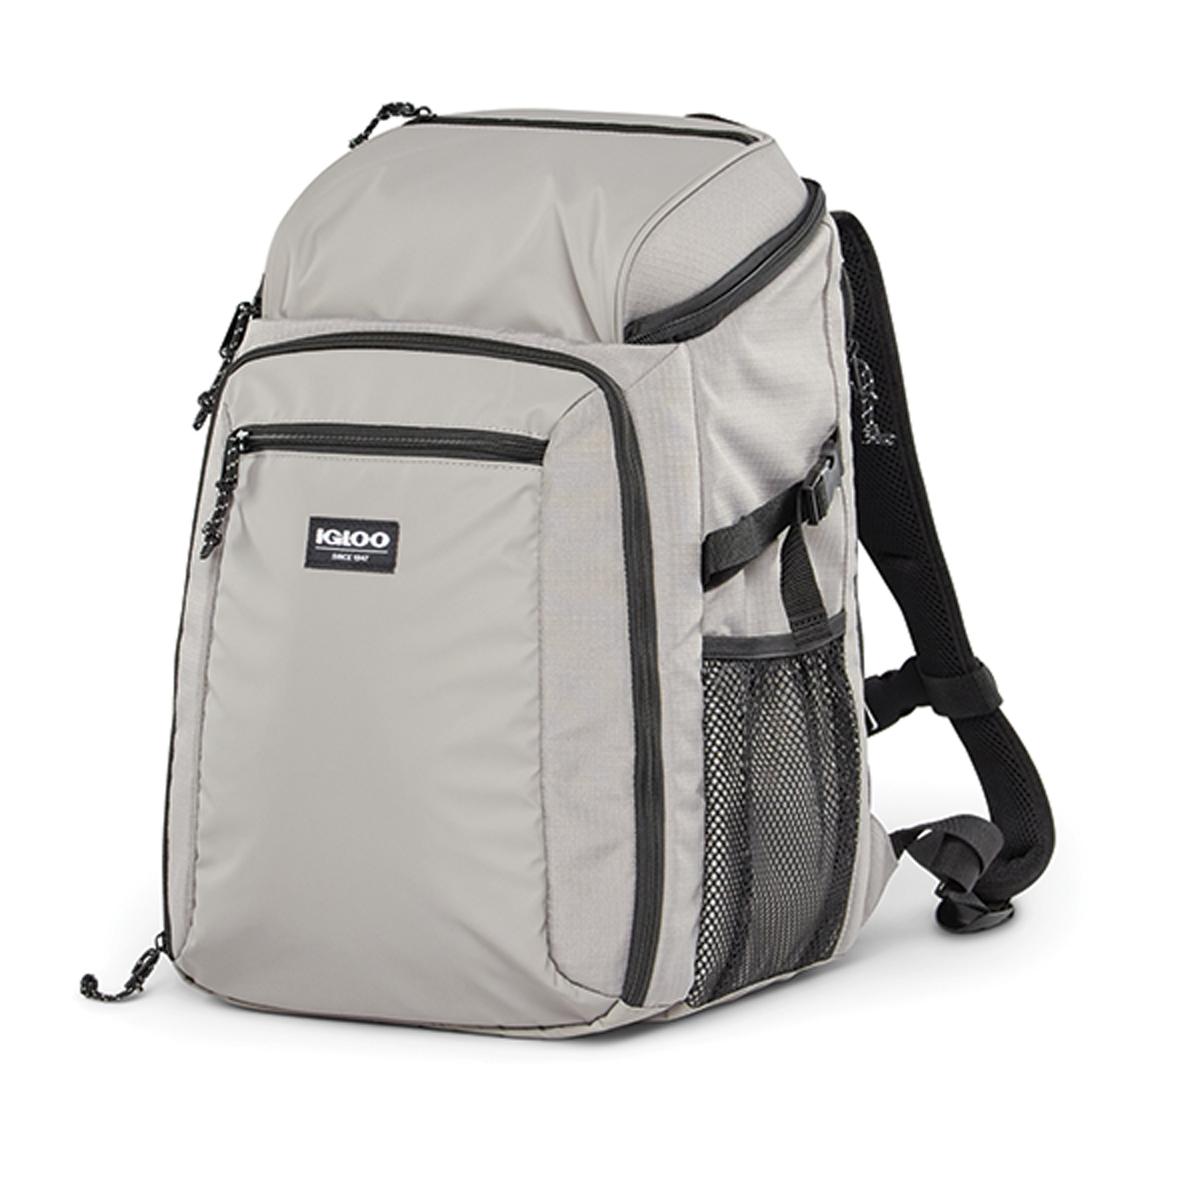 Outdoorsman Gizmo Backpack, Sand,Sandstone,Flax,Hemp, swatch